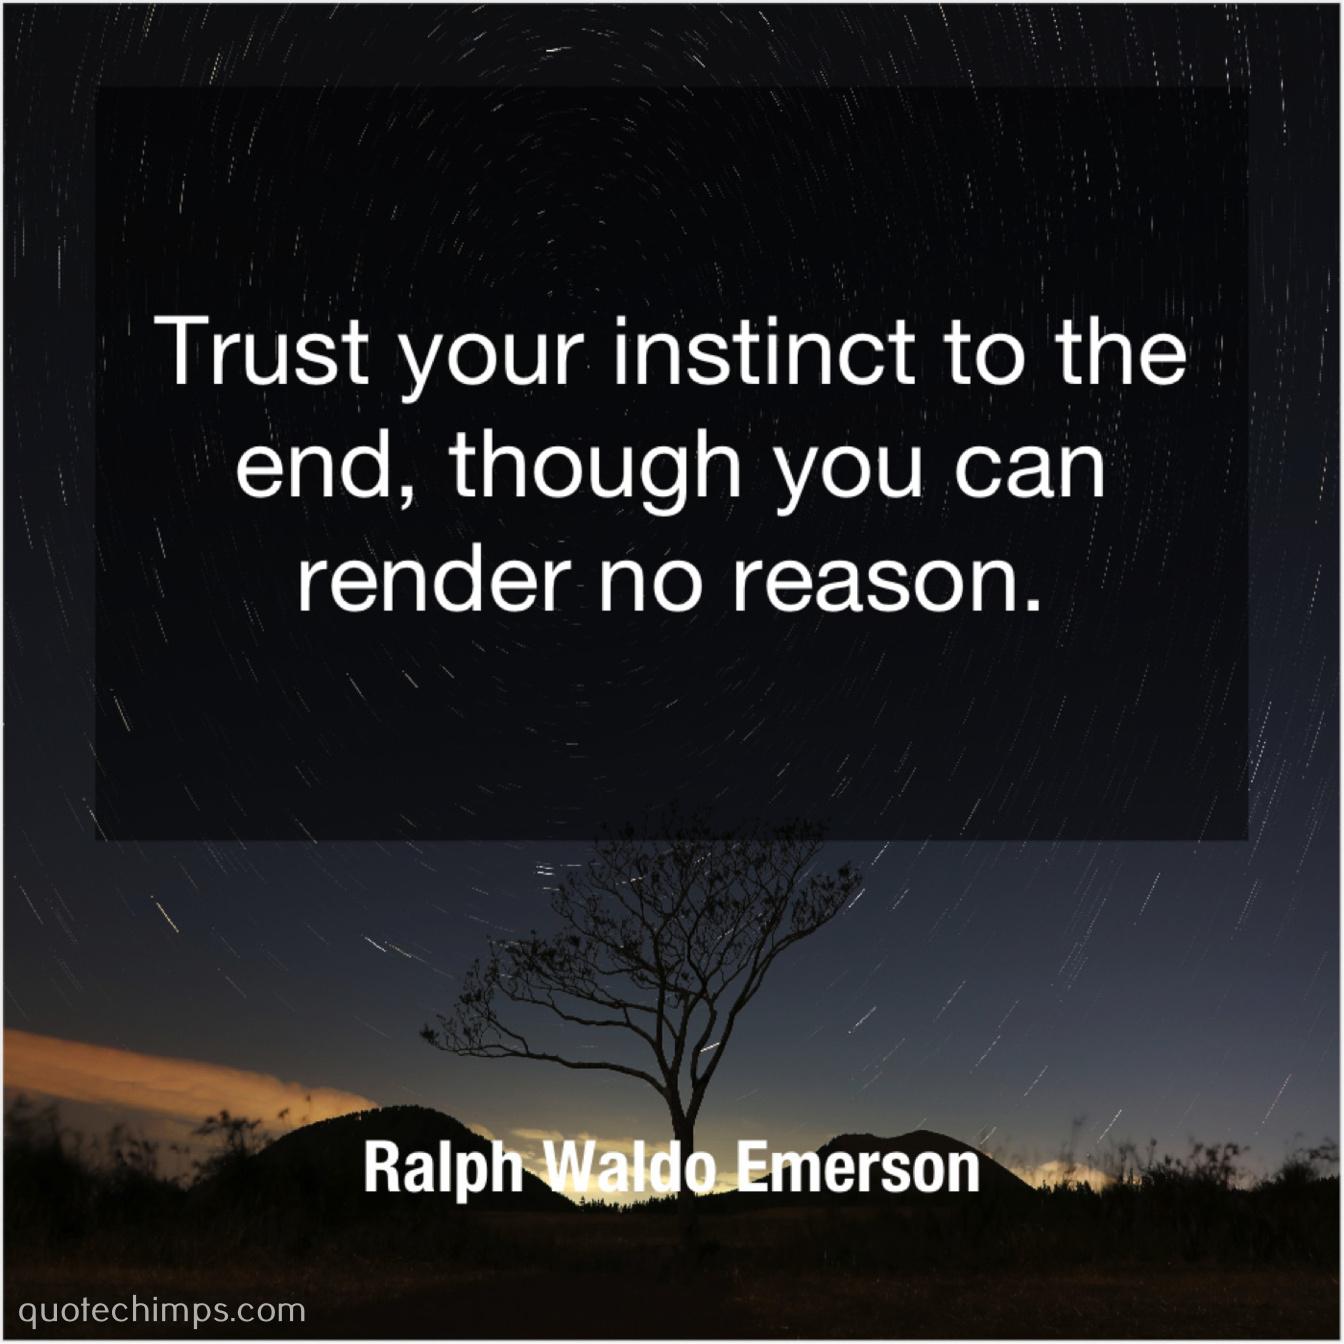 Ralph Waldo Emerson Trust Your Instinct To The